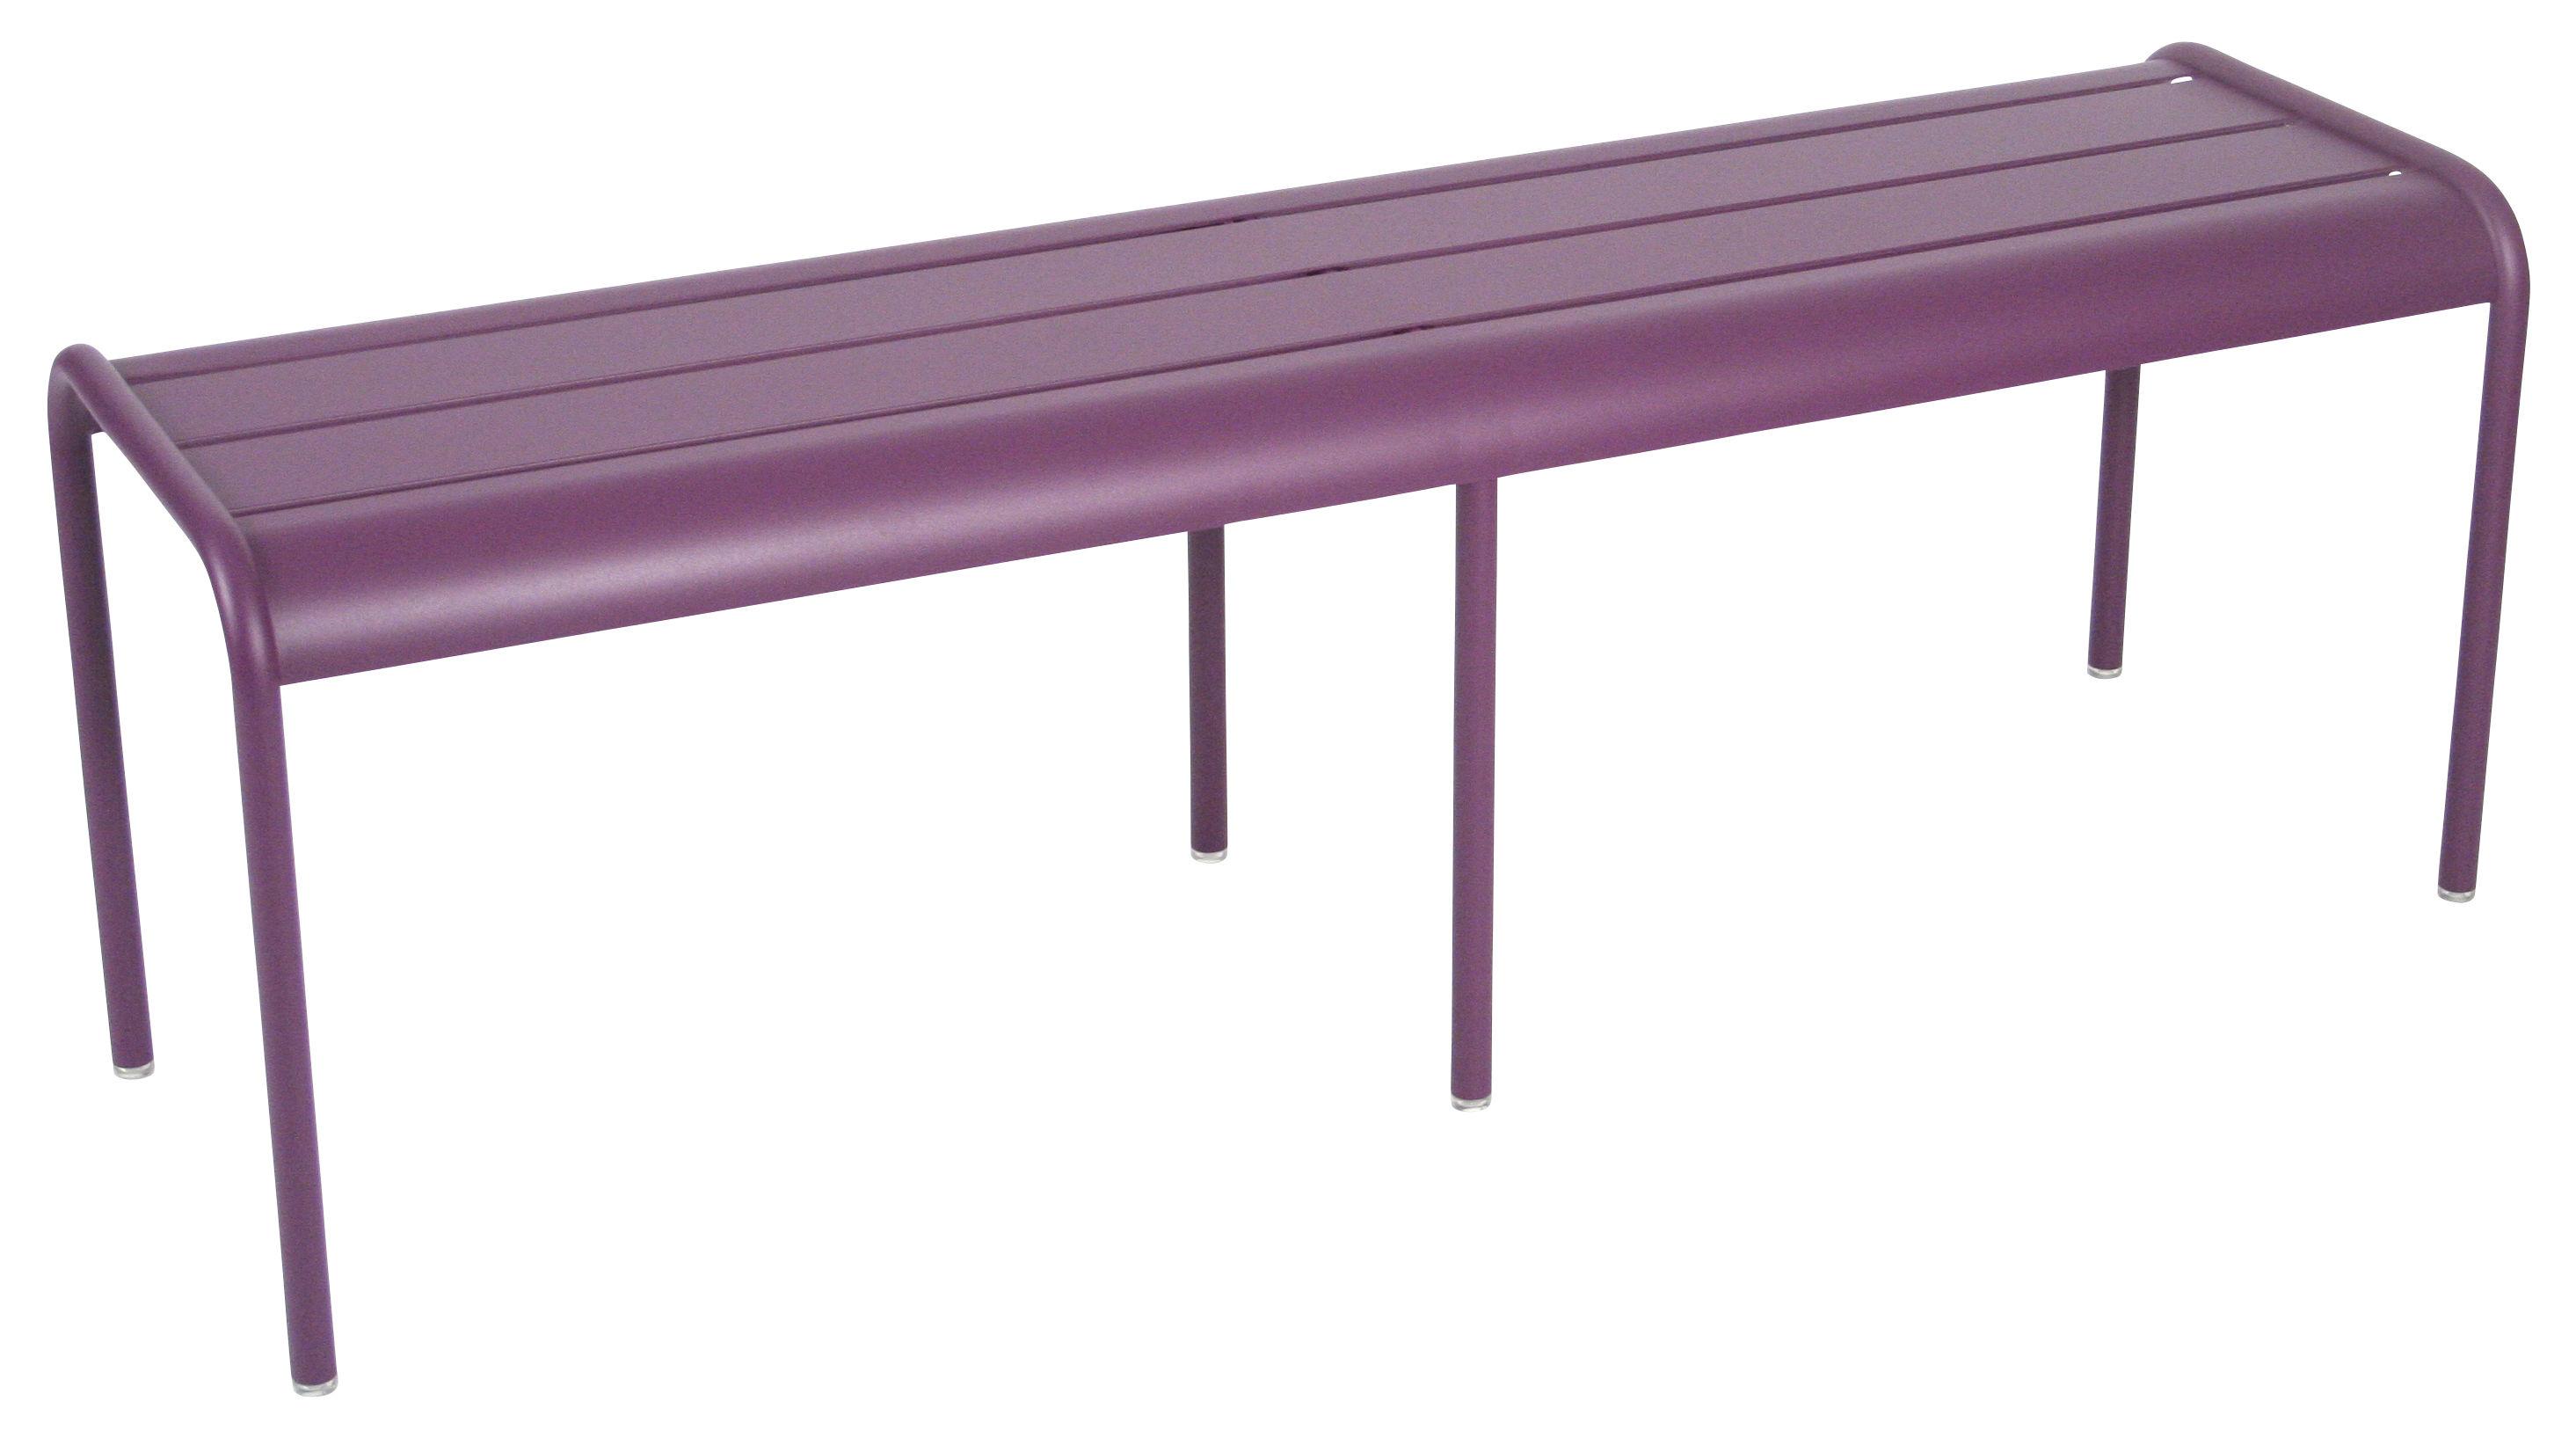 banc luxembourg 3 4 places l 145 cm aluminium aubergine fermob. Black Bedroom Furniture Sets. Home Design Ideas